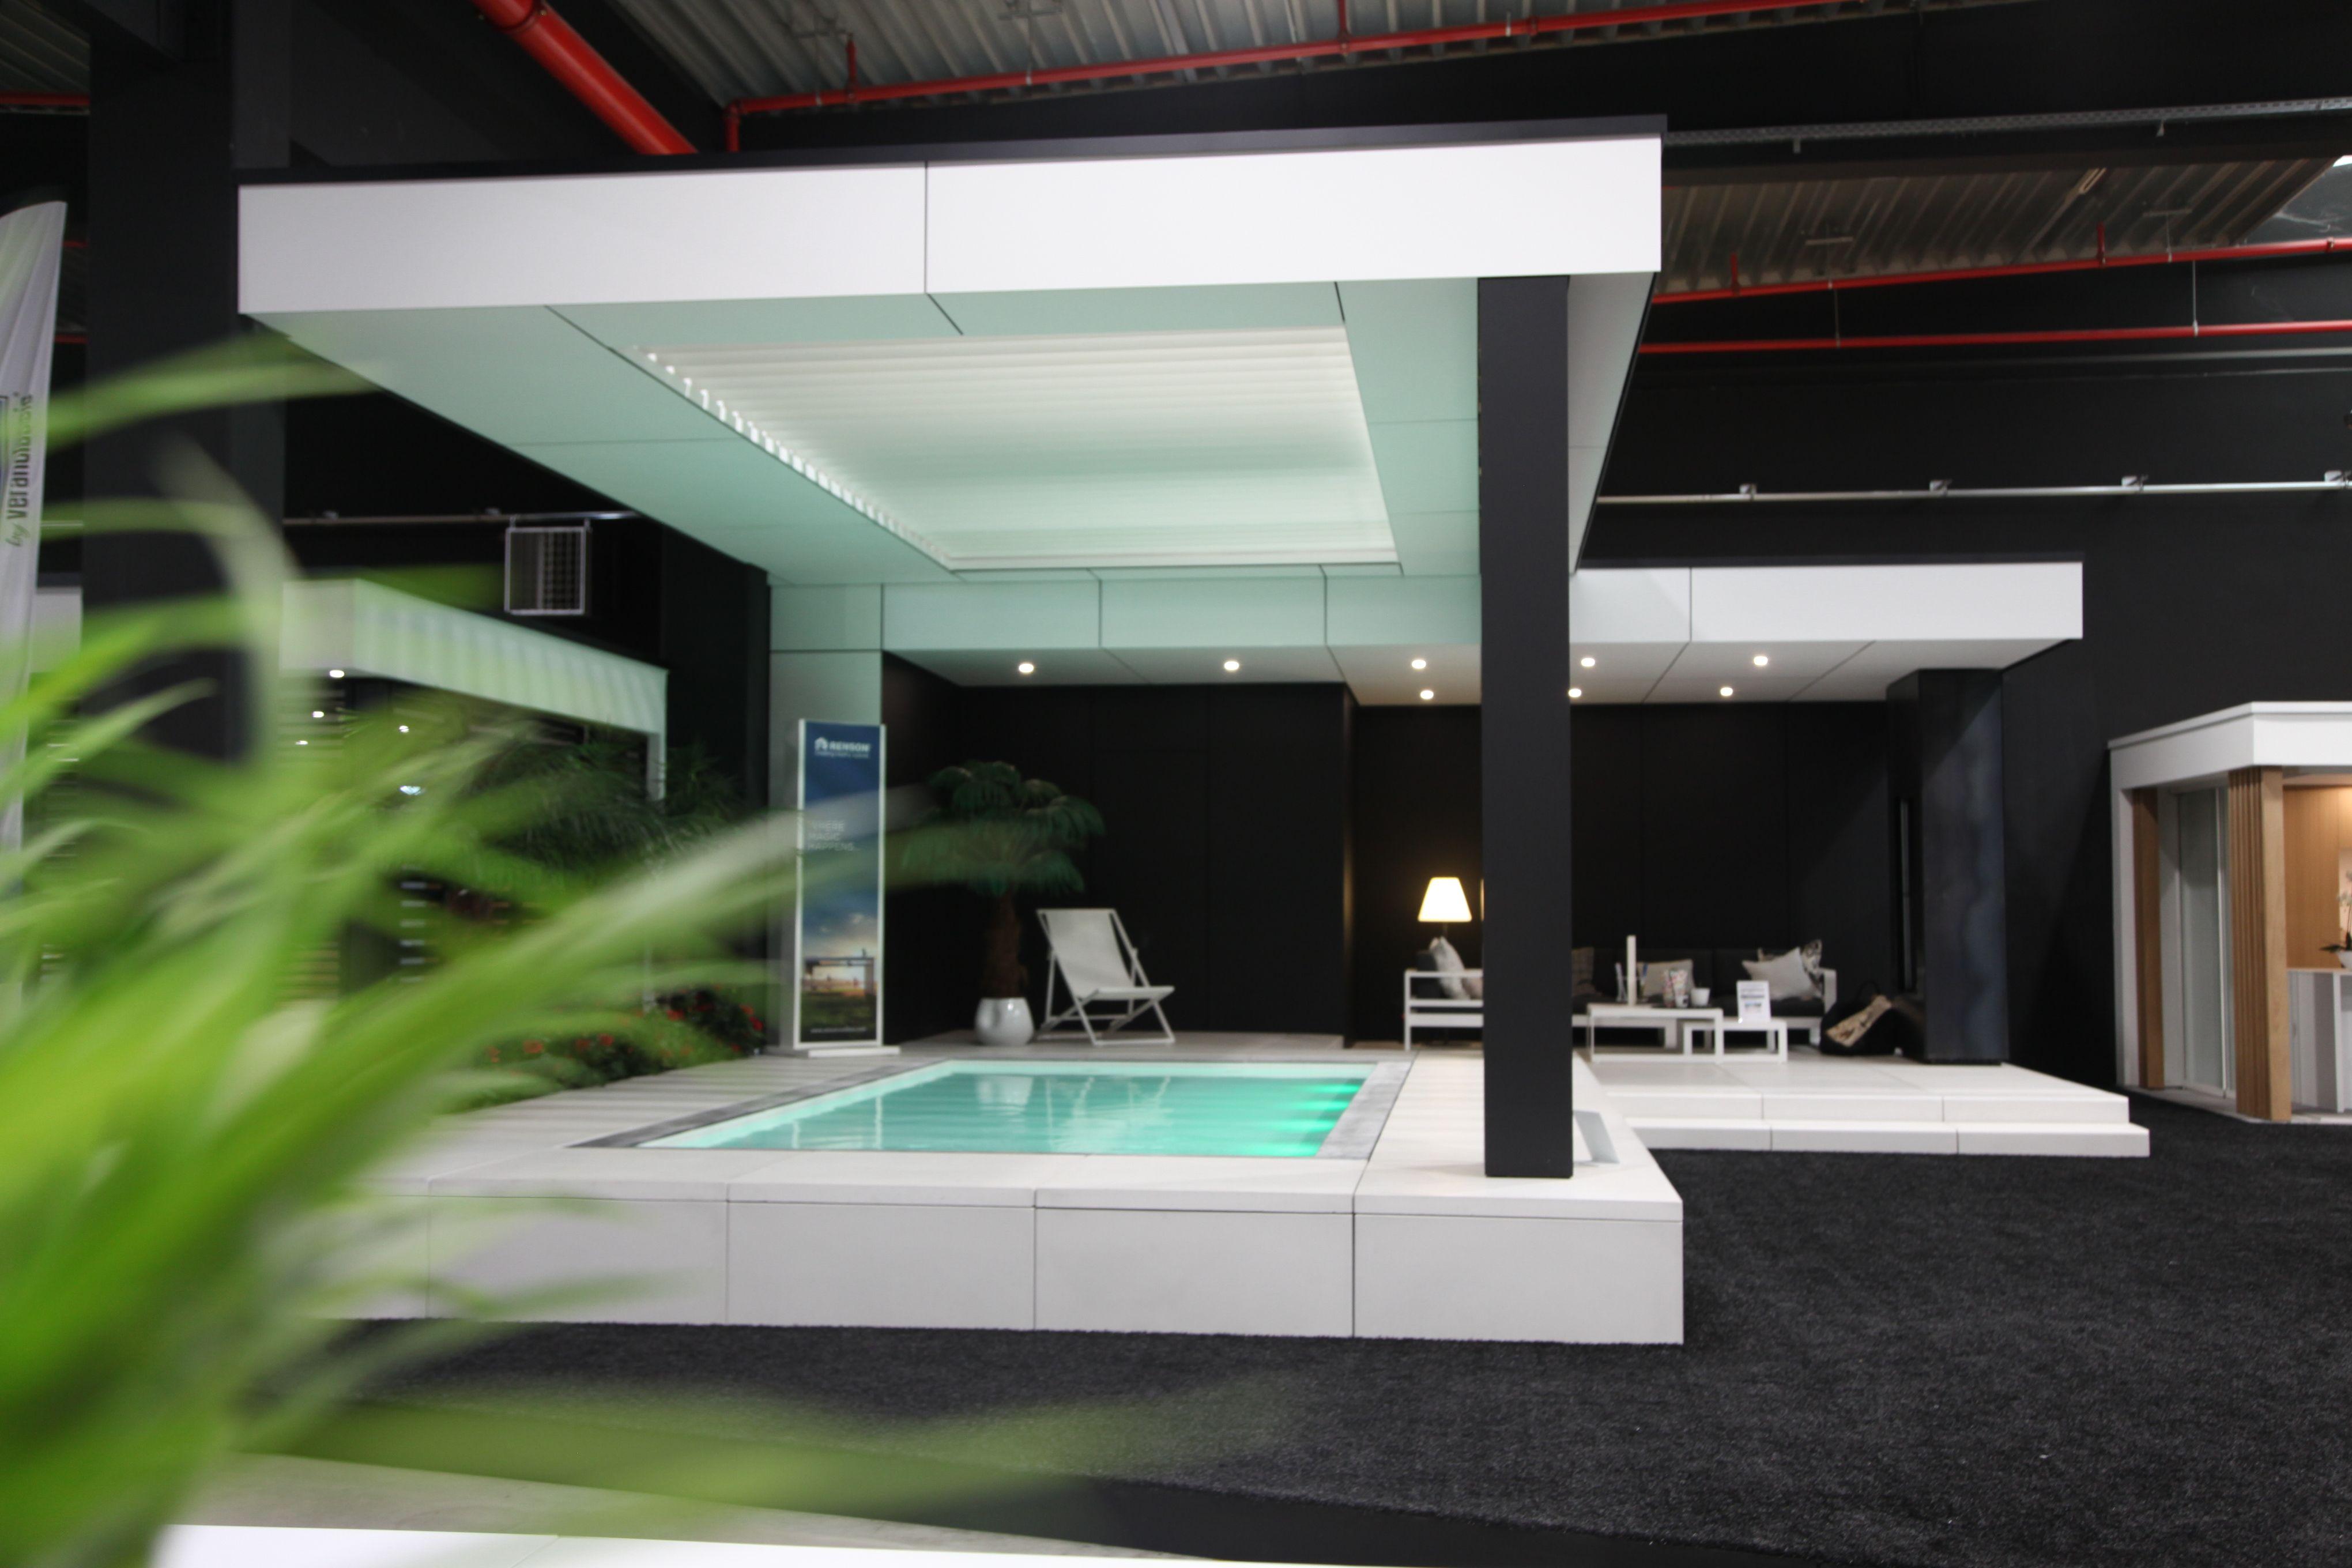 Poolhouse Trespa in showroom Veranclassic te Dottenijs